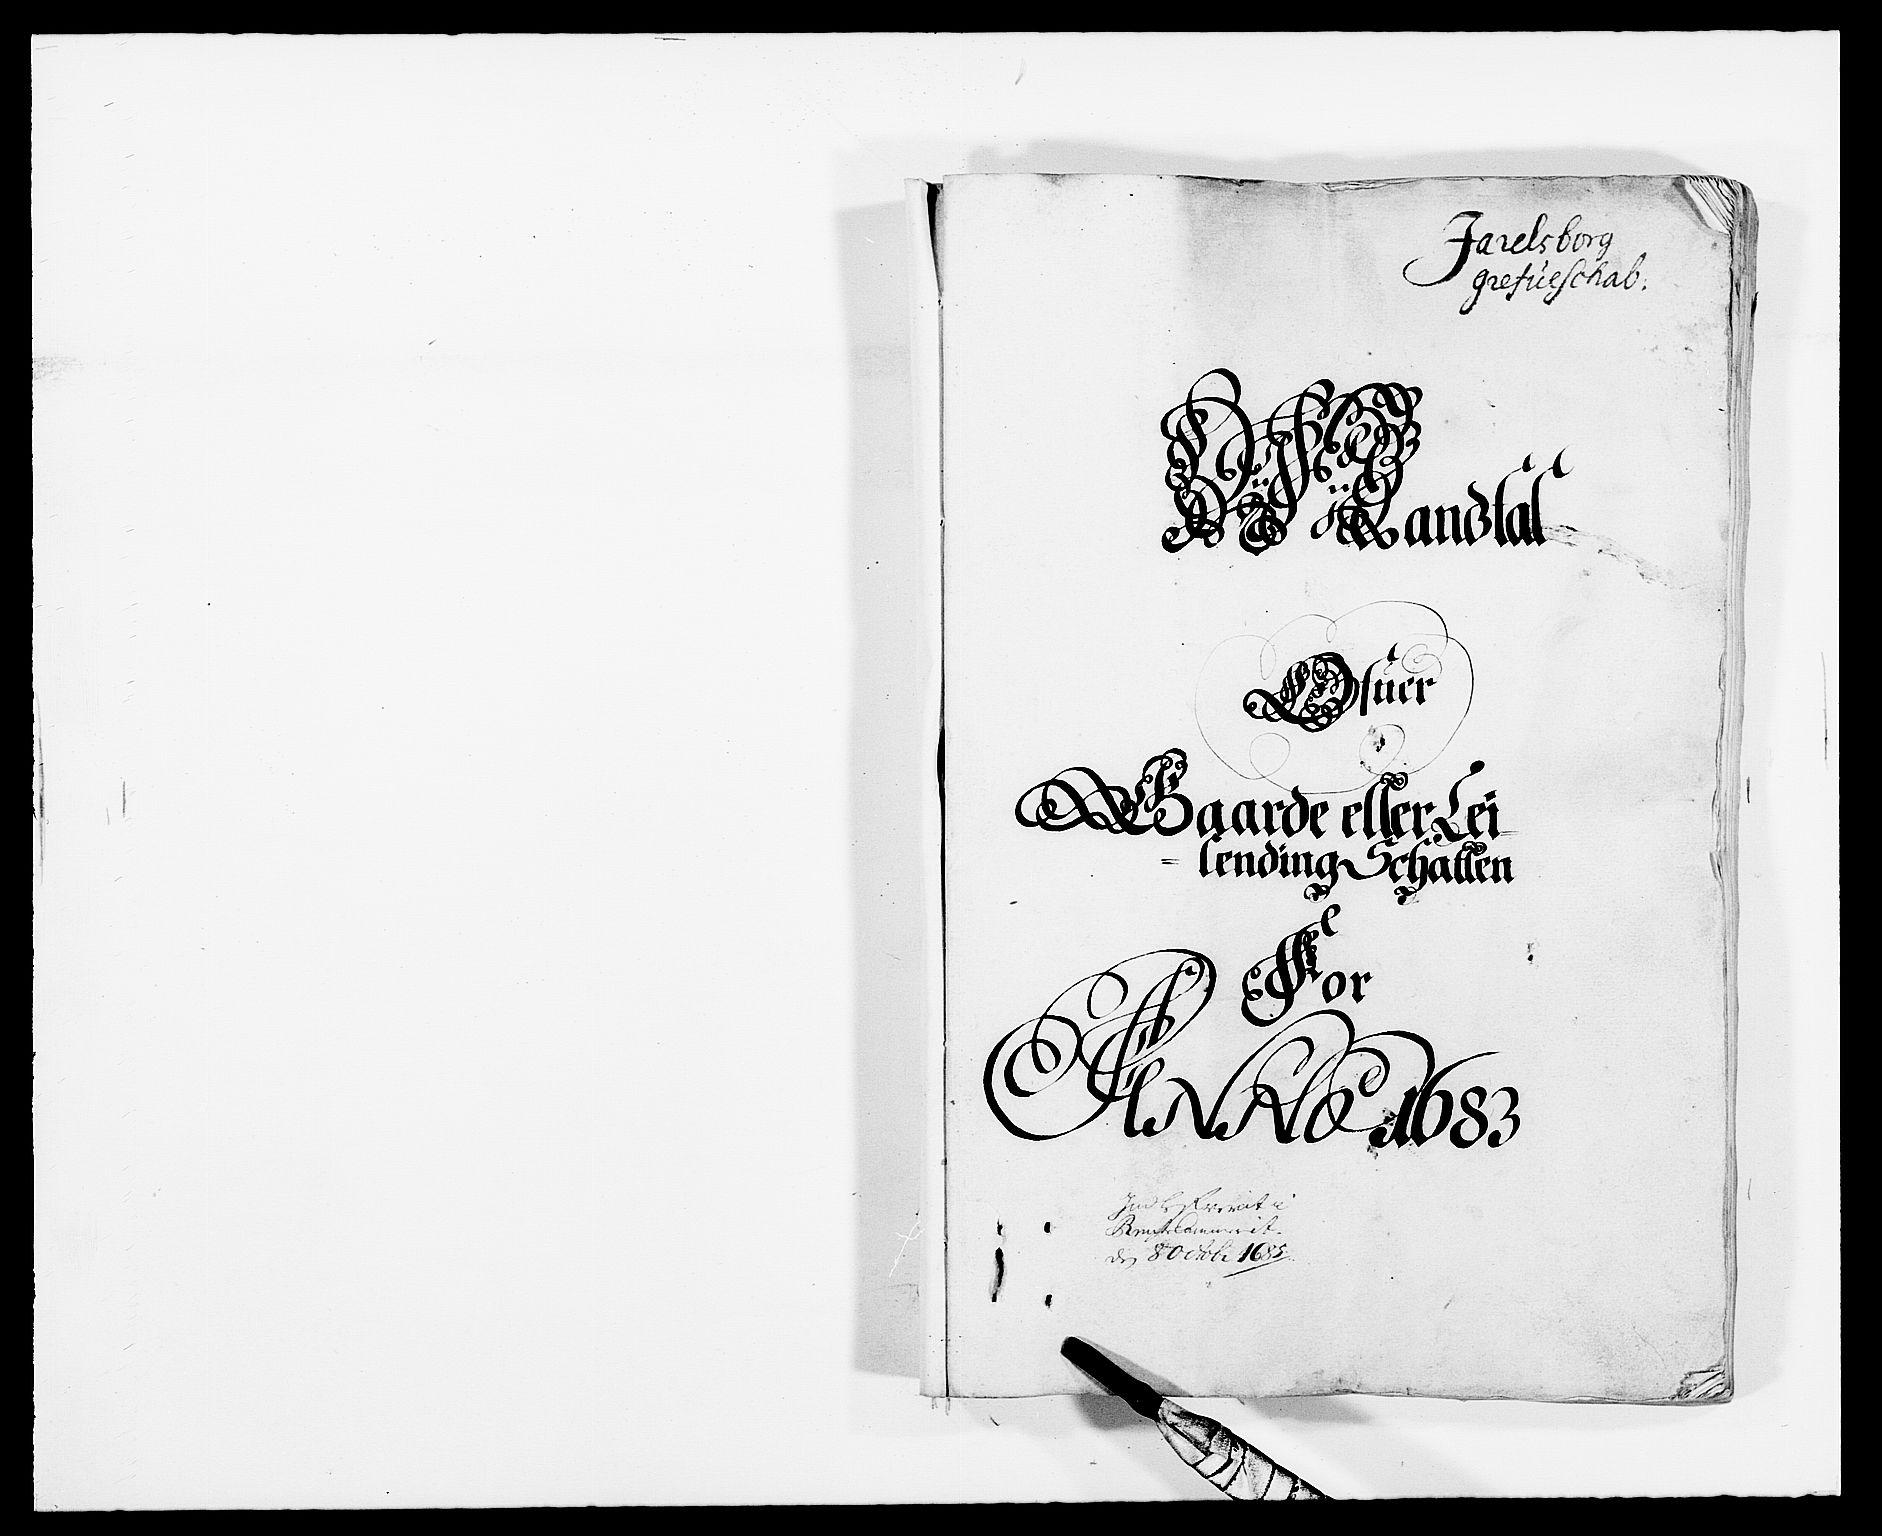 RA, Rentekammeret inntil 1814, Reviderte regnskaper, Fogderegnskap, R32/L1852: Fogderegnskap Jarlsberg grevskap, 1683, s. 10